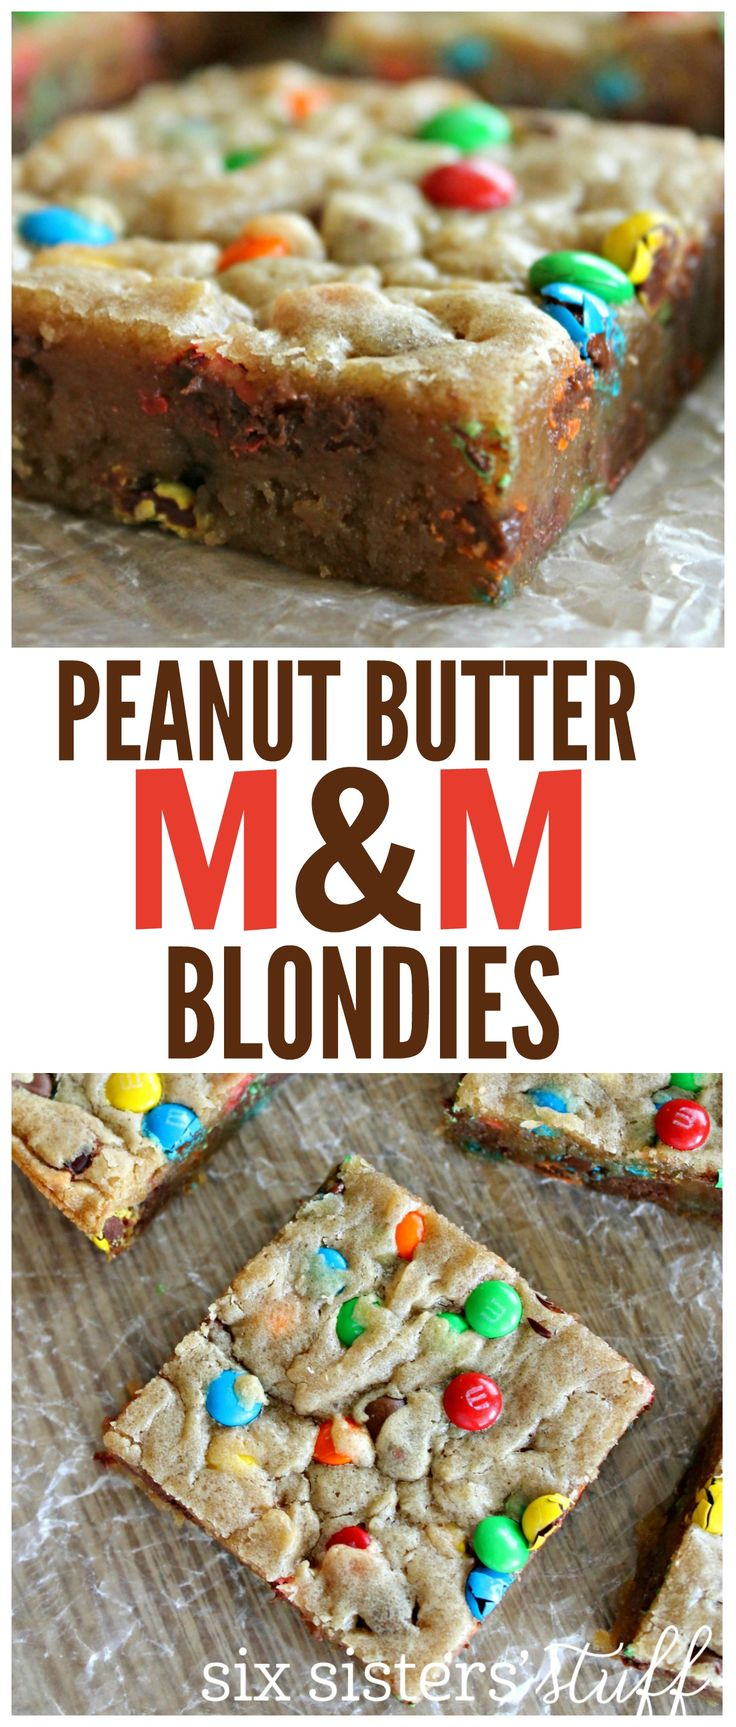 Peanut Butter M&M 5